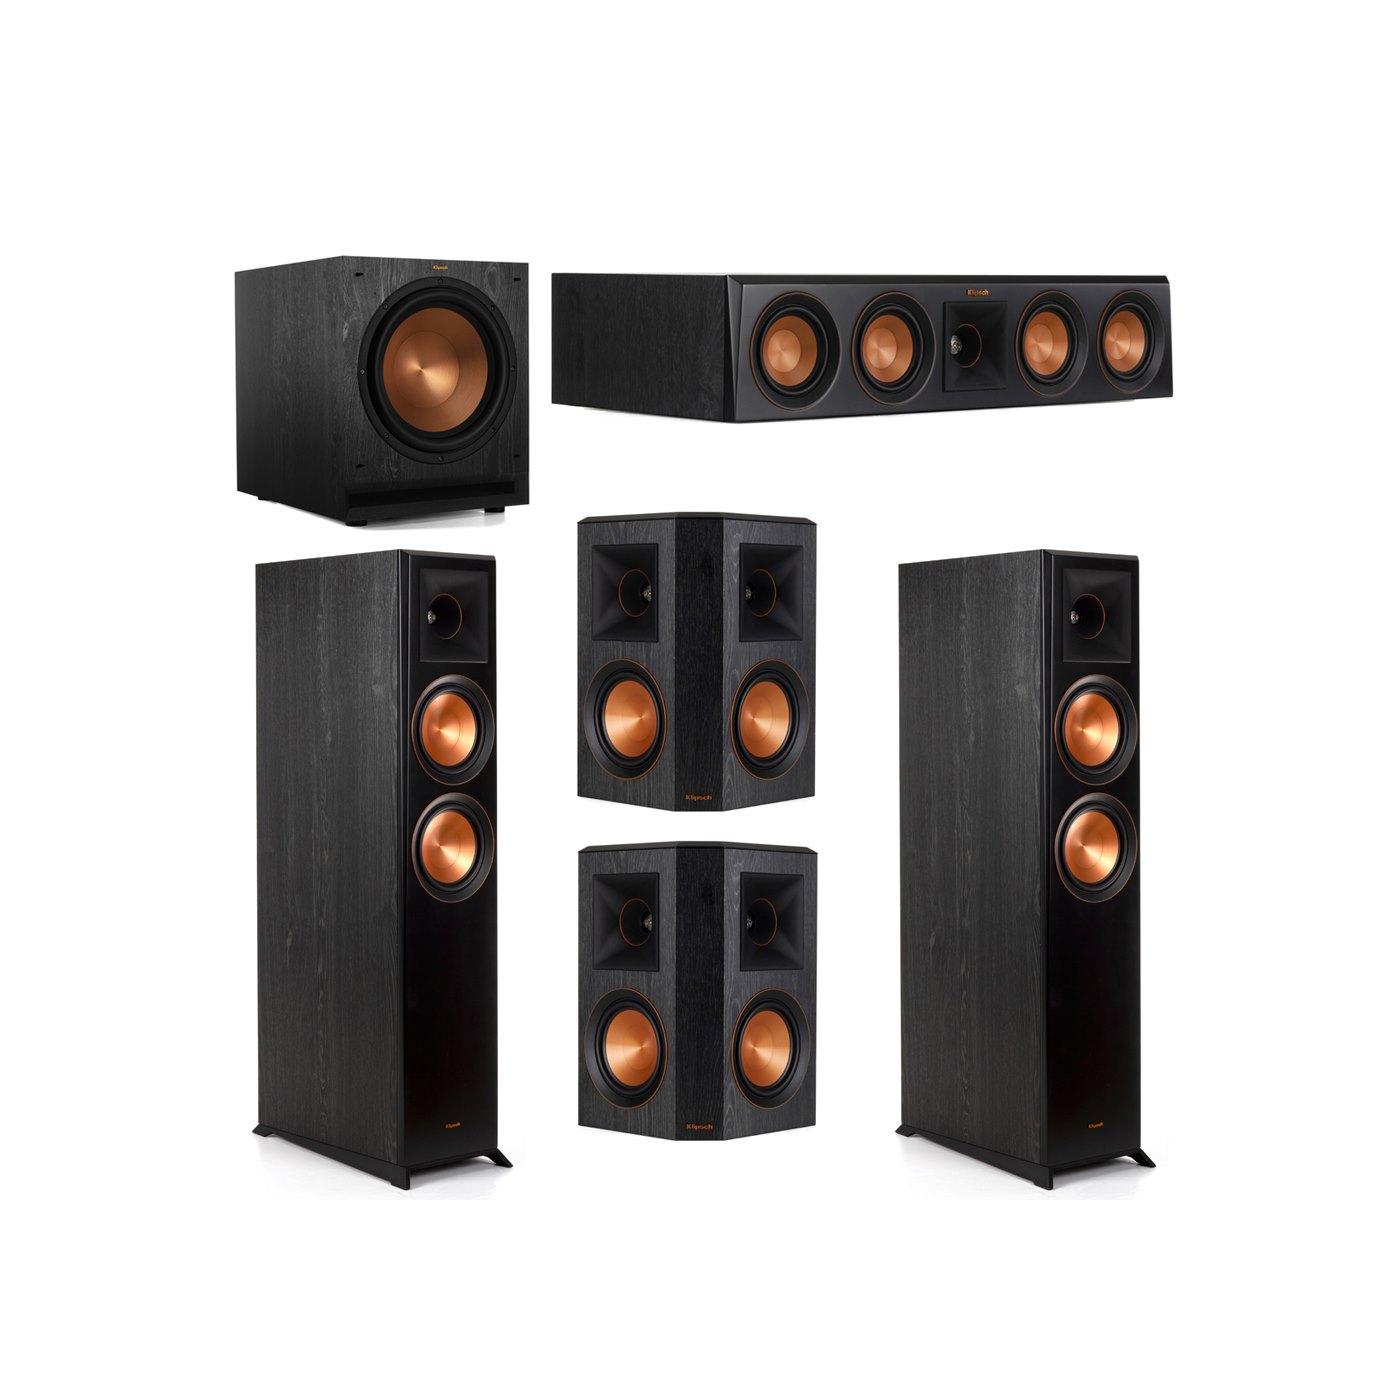 Klipsch 5.1 System with 2 RP-6000F Floorstanding Speakers, 1 Klipsch RP-404C Center Speaker, 2 Klipsch RP-502S Surround Speakers, 1 Klipsch SPL-120 Subwoofer